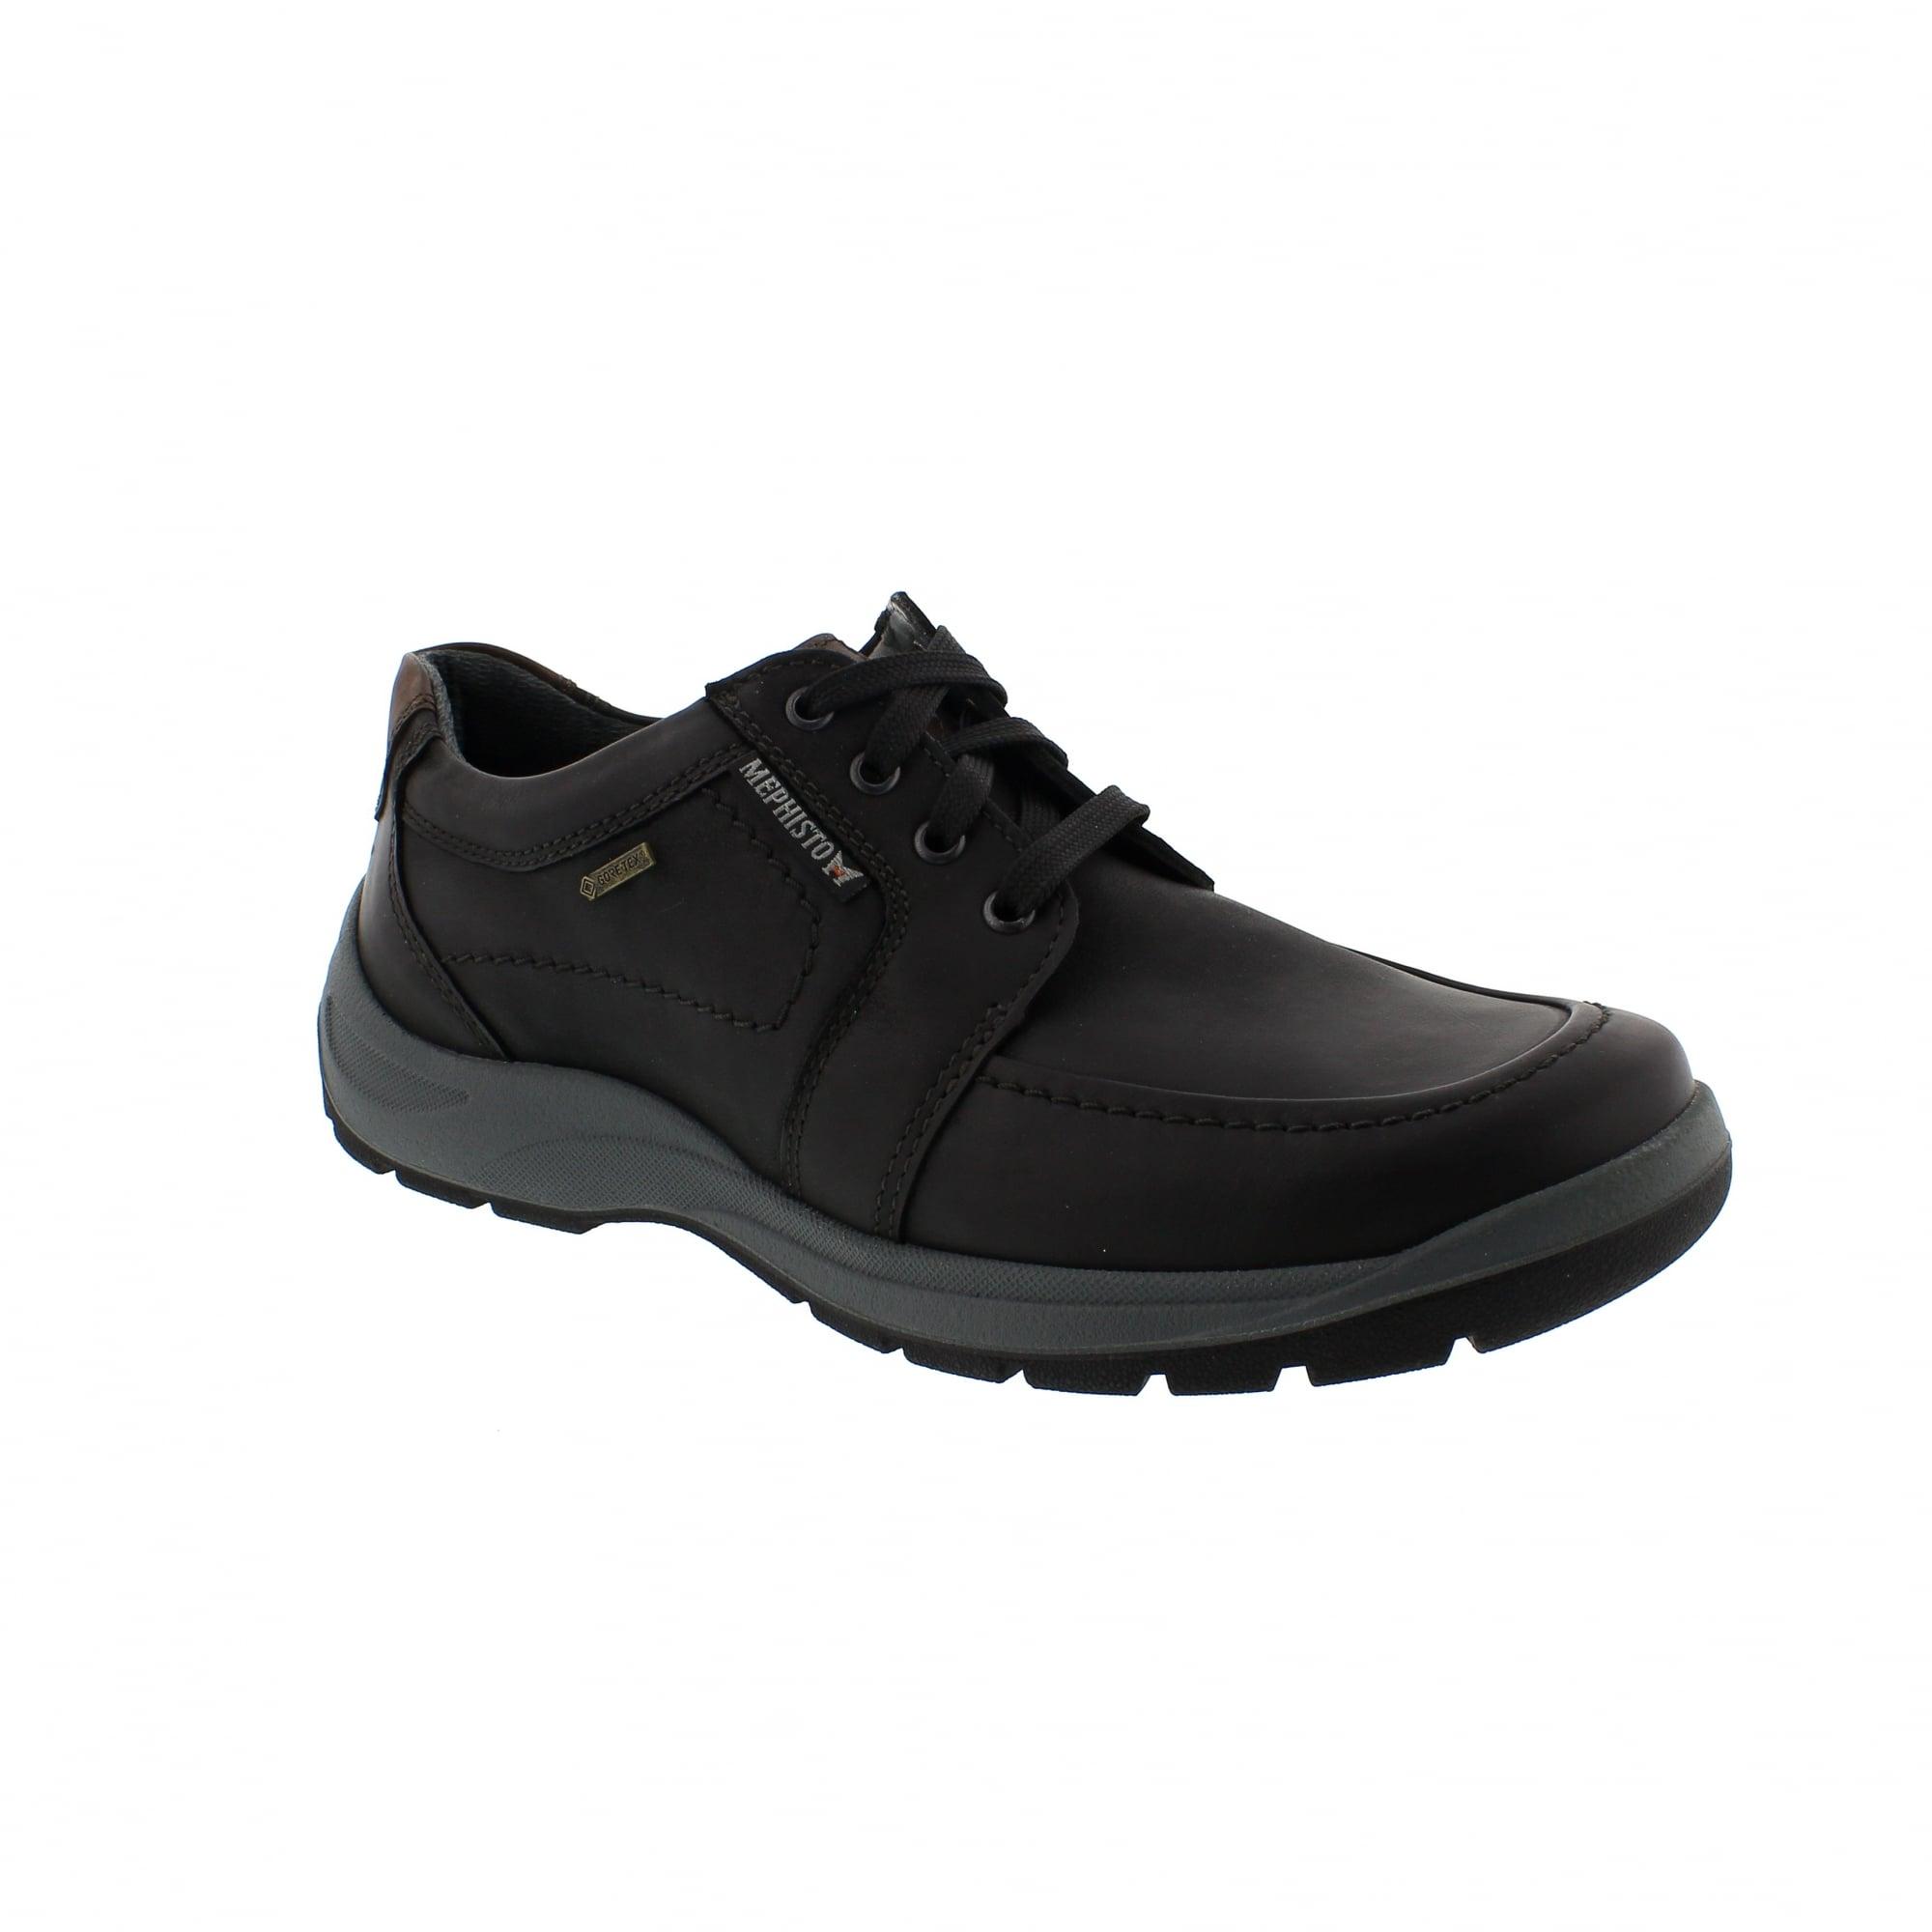 2707c7b54de8c2 Mephisto Bristol Gt 100 151 Mens Walking Shoes